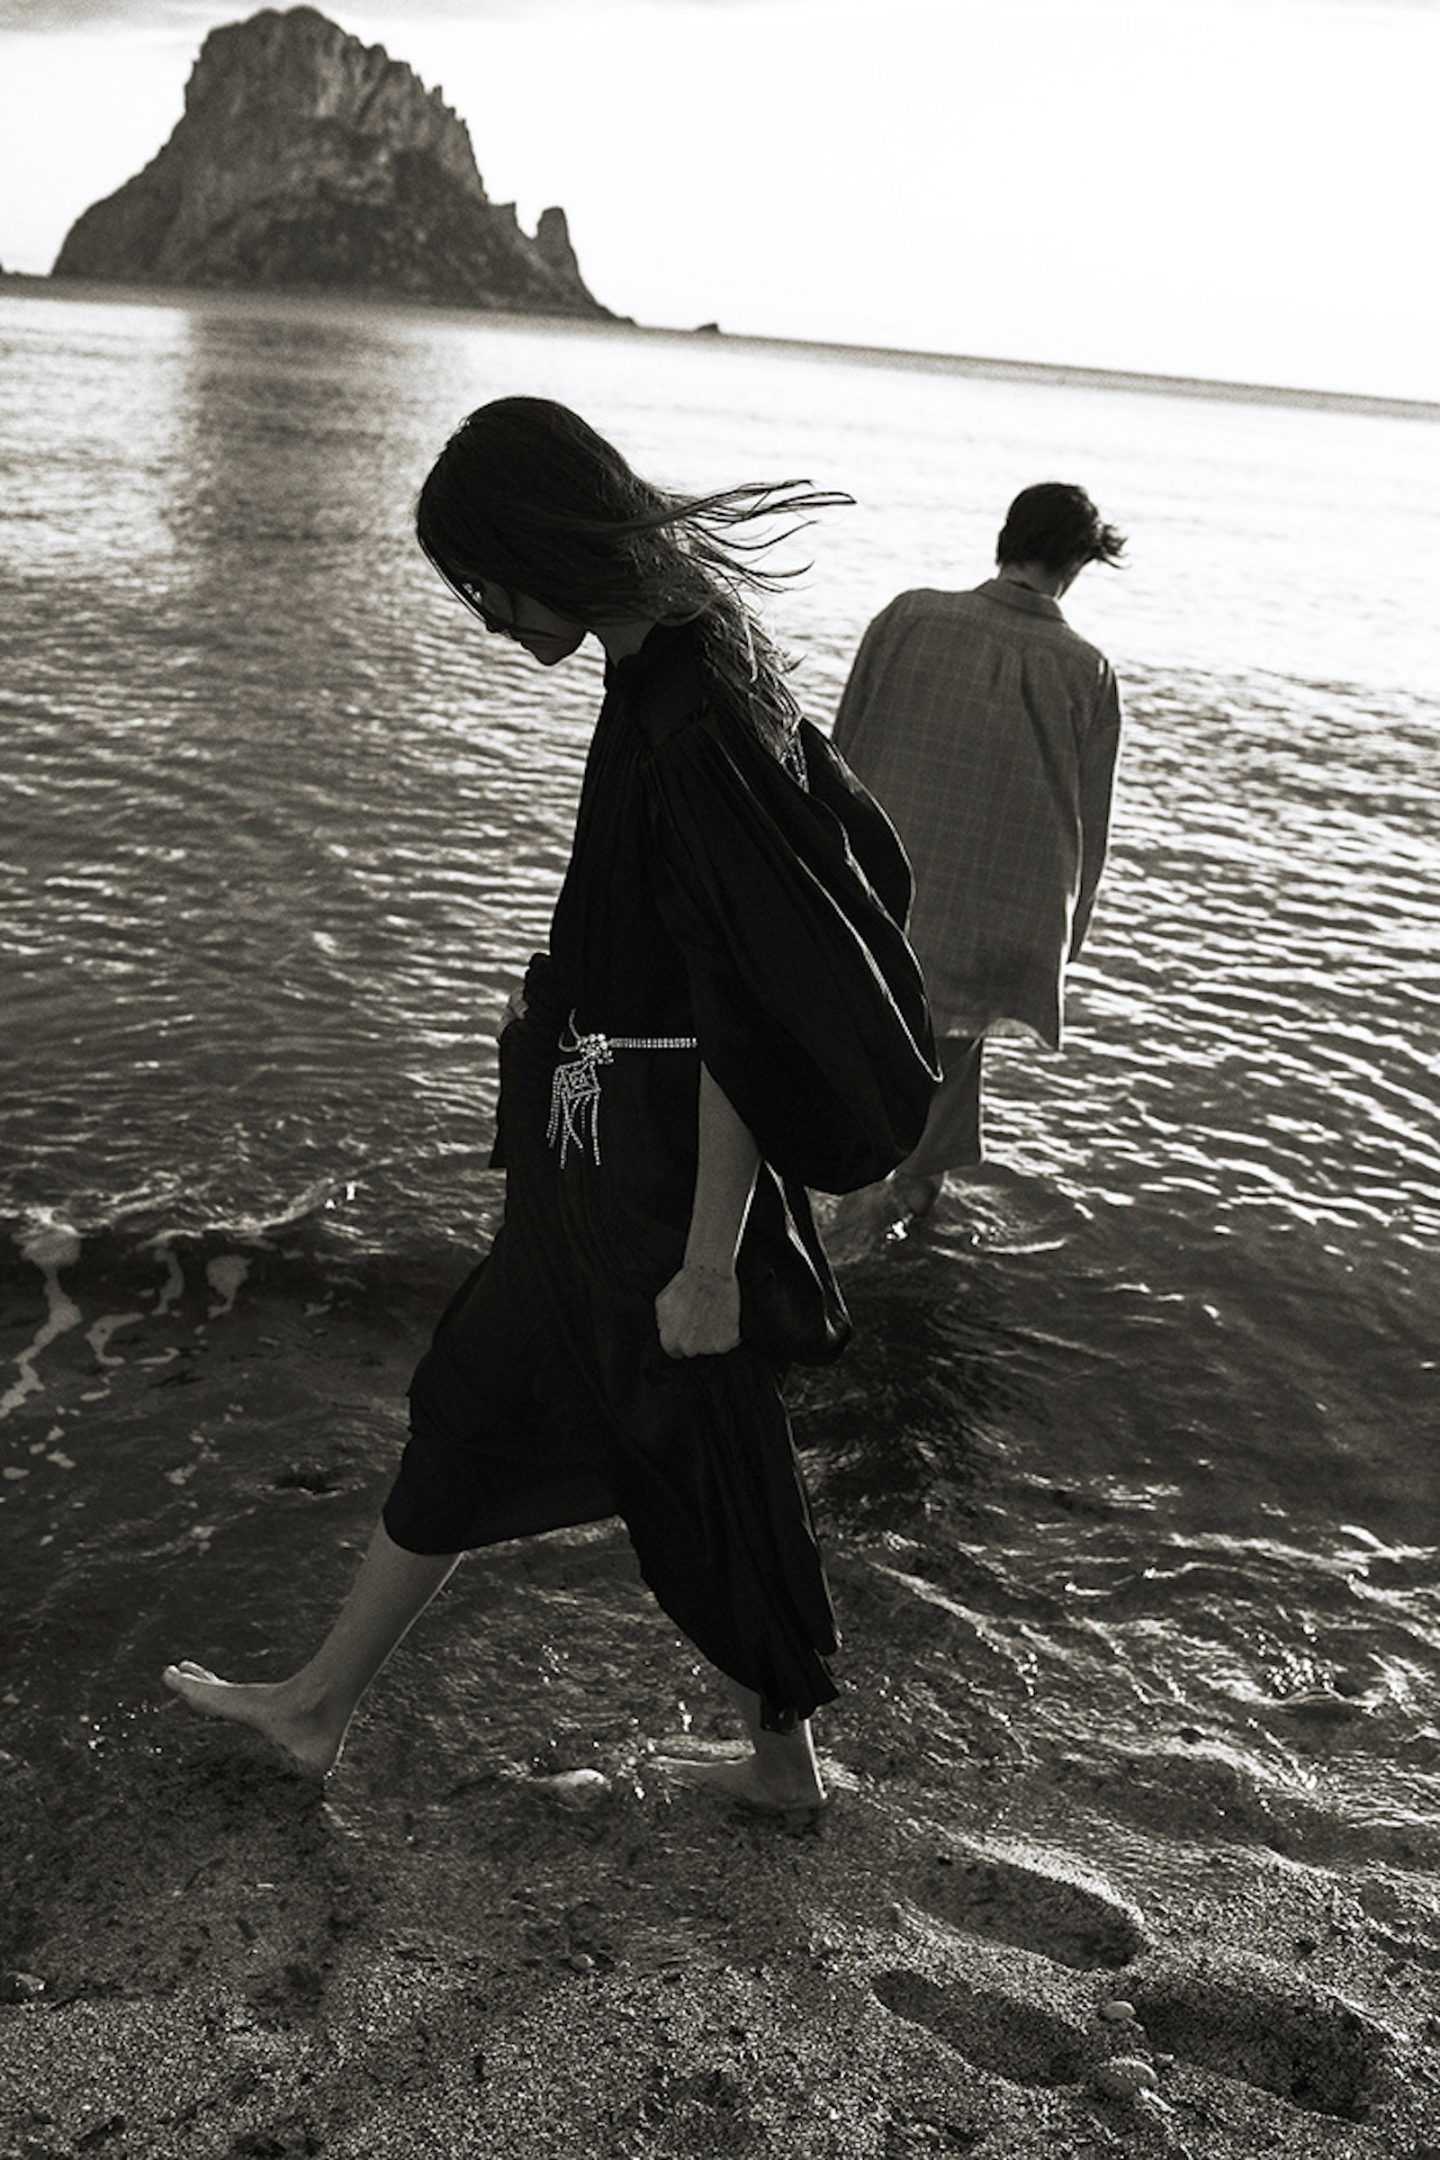 IGNANT-Photography-Sonia-Szostak-02